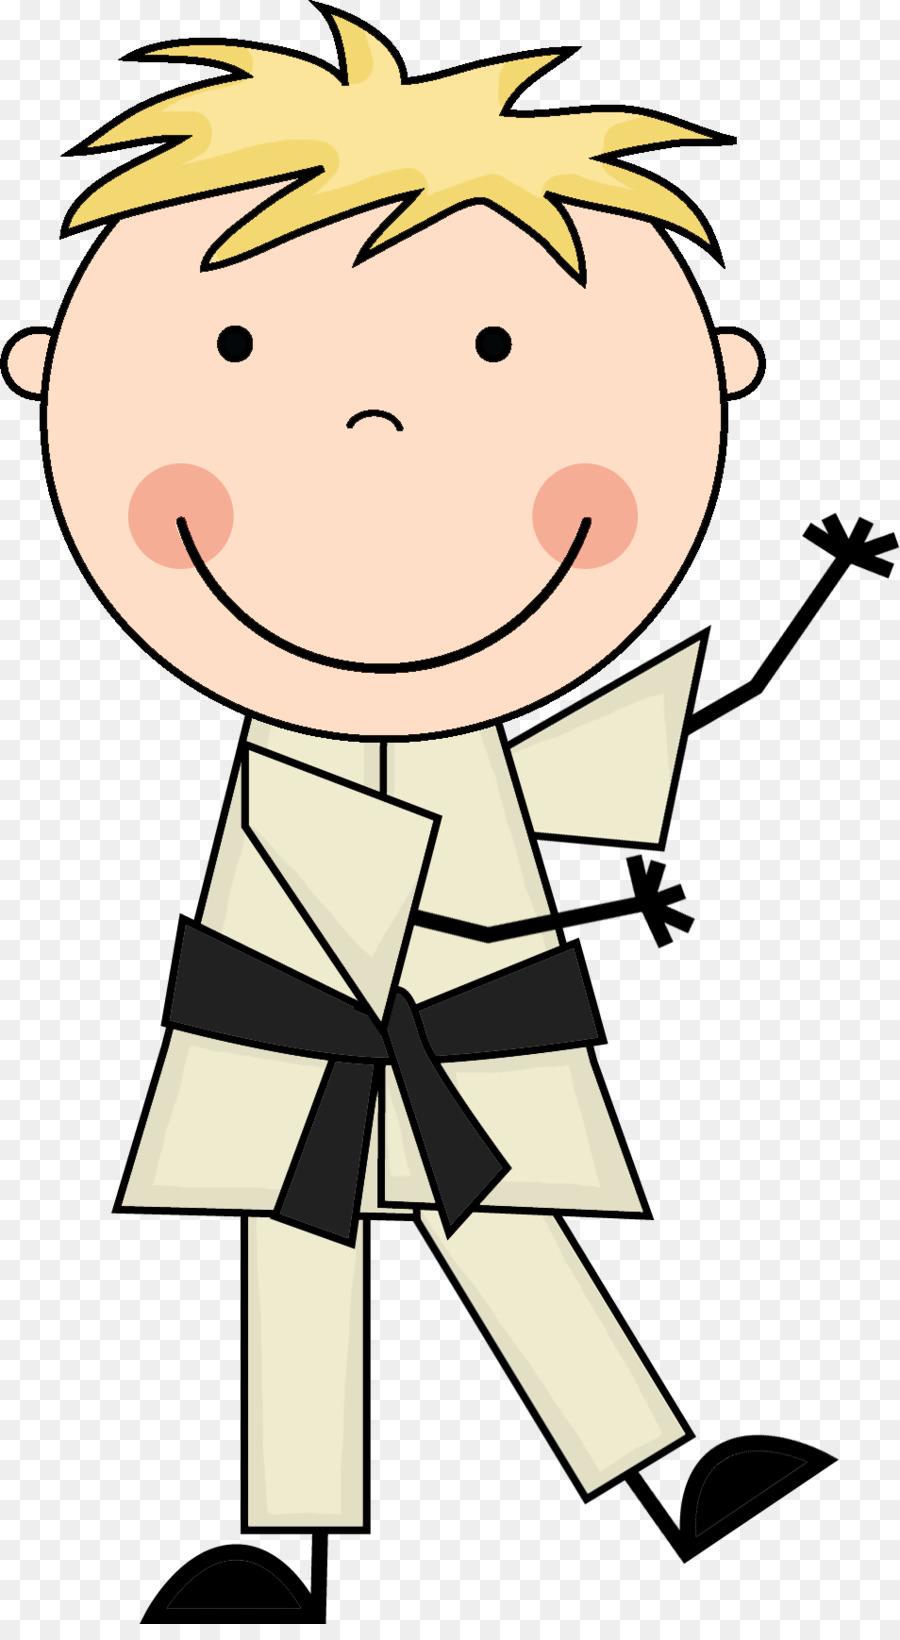 karate clip art child taekwondo poster material png download 954 rh kisspng com taekwondo clipart black and white taekwondo clipart free